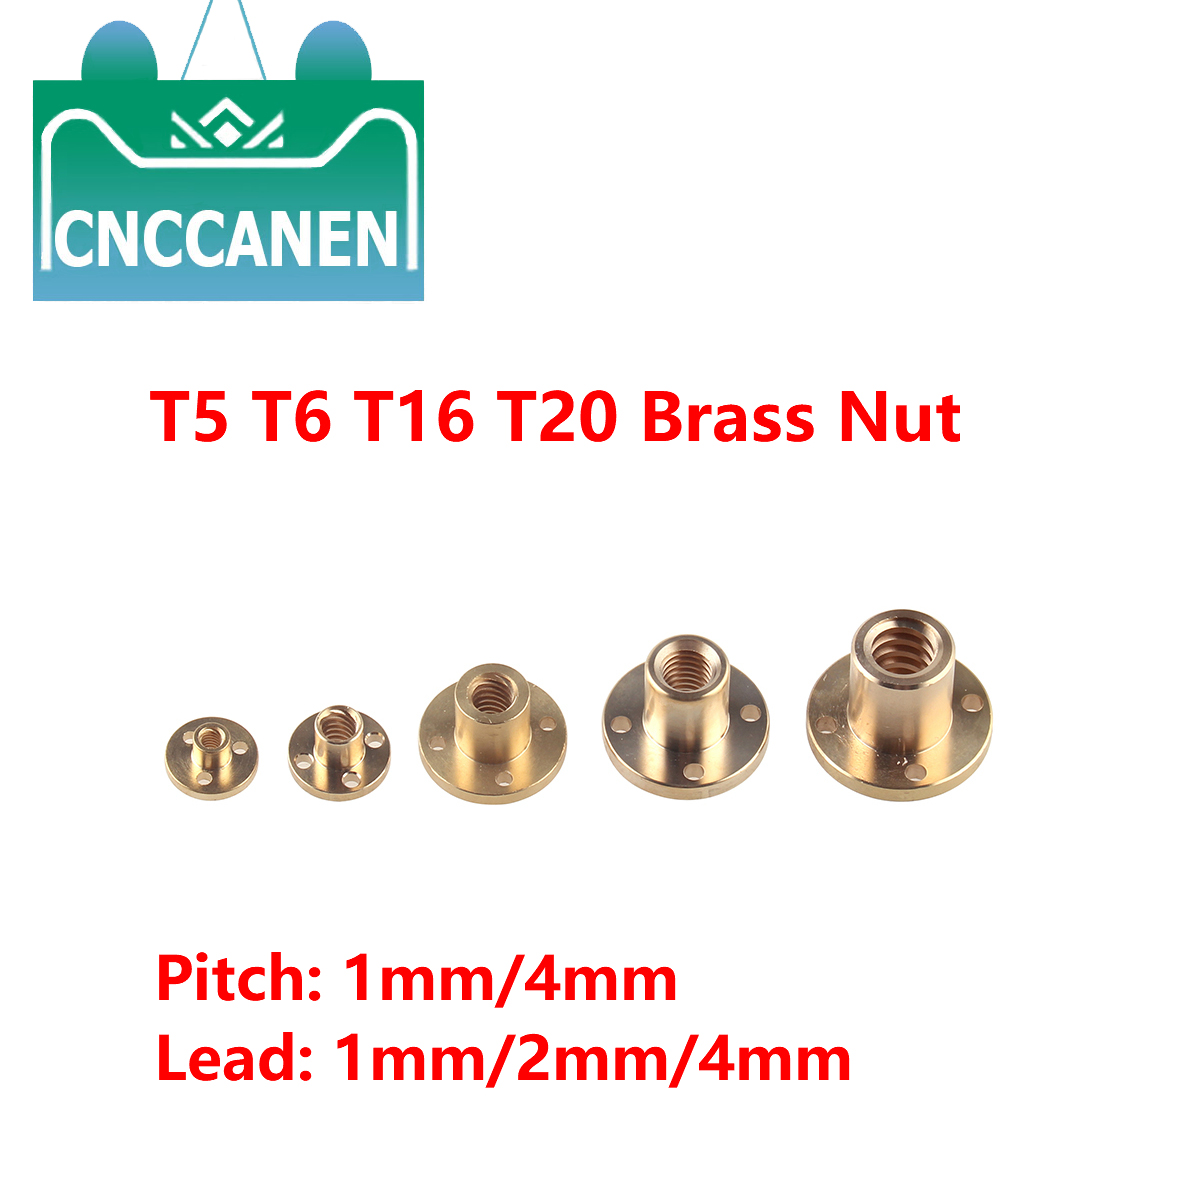 T5 T6 T16 T20 Leadscrew Nut Pitch 1mm/2mm Lead 1mm/2mm/4mm Brass Lead Screw Nut For CNC Parts 3D Printer Accessories